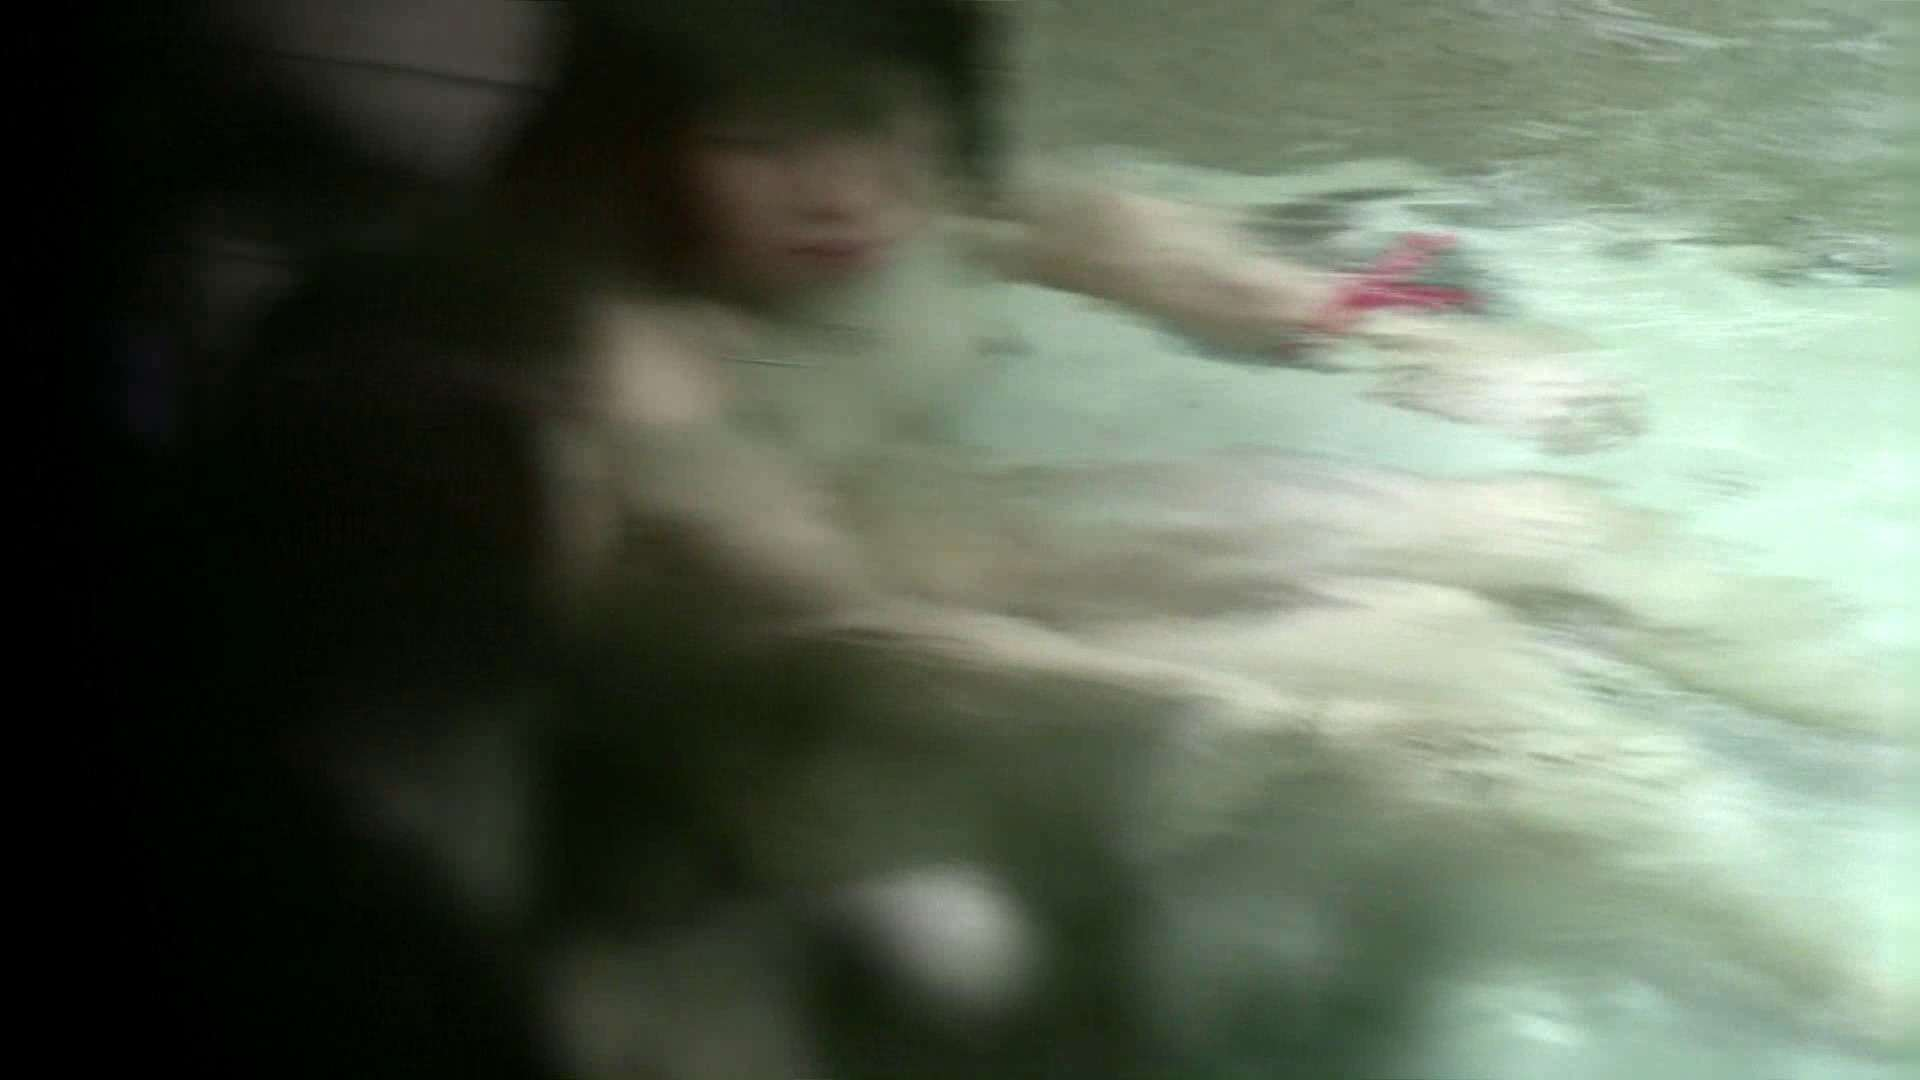 Aquaな露天風呂Vol.655 露天風呂編  86PIX 38